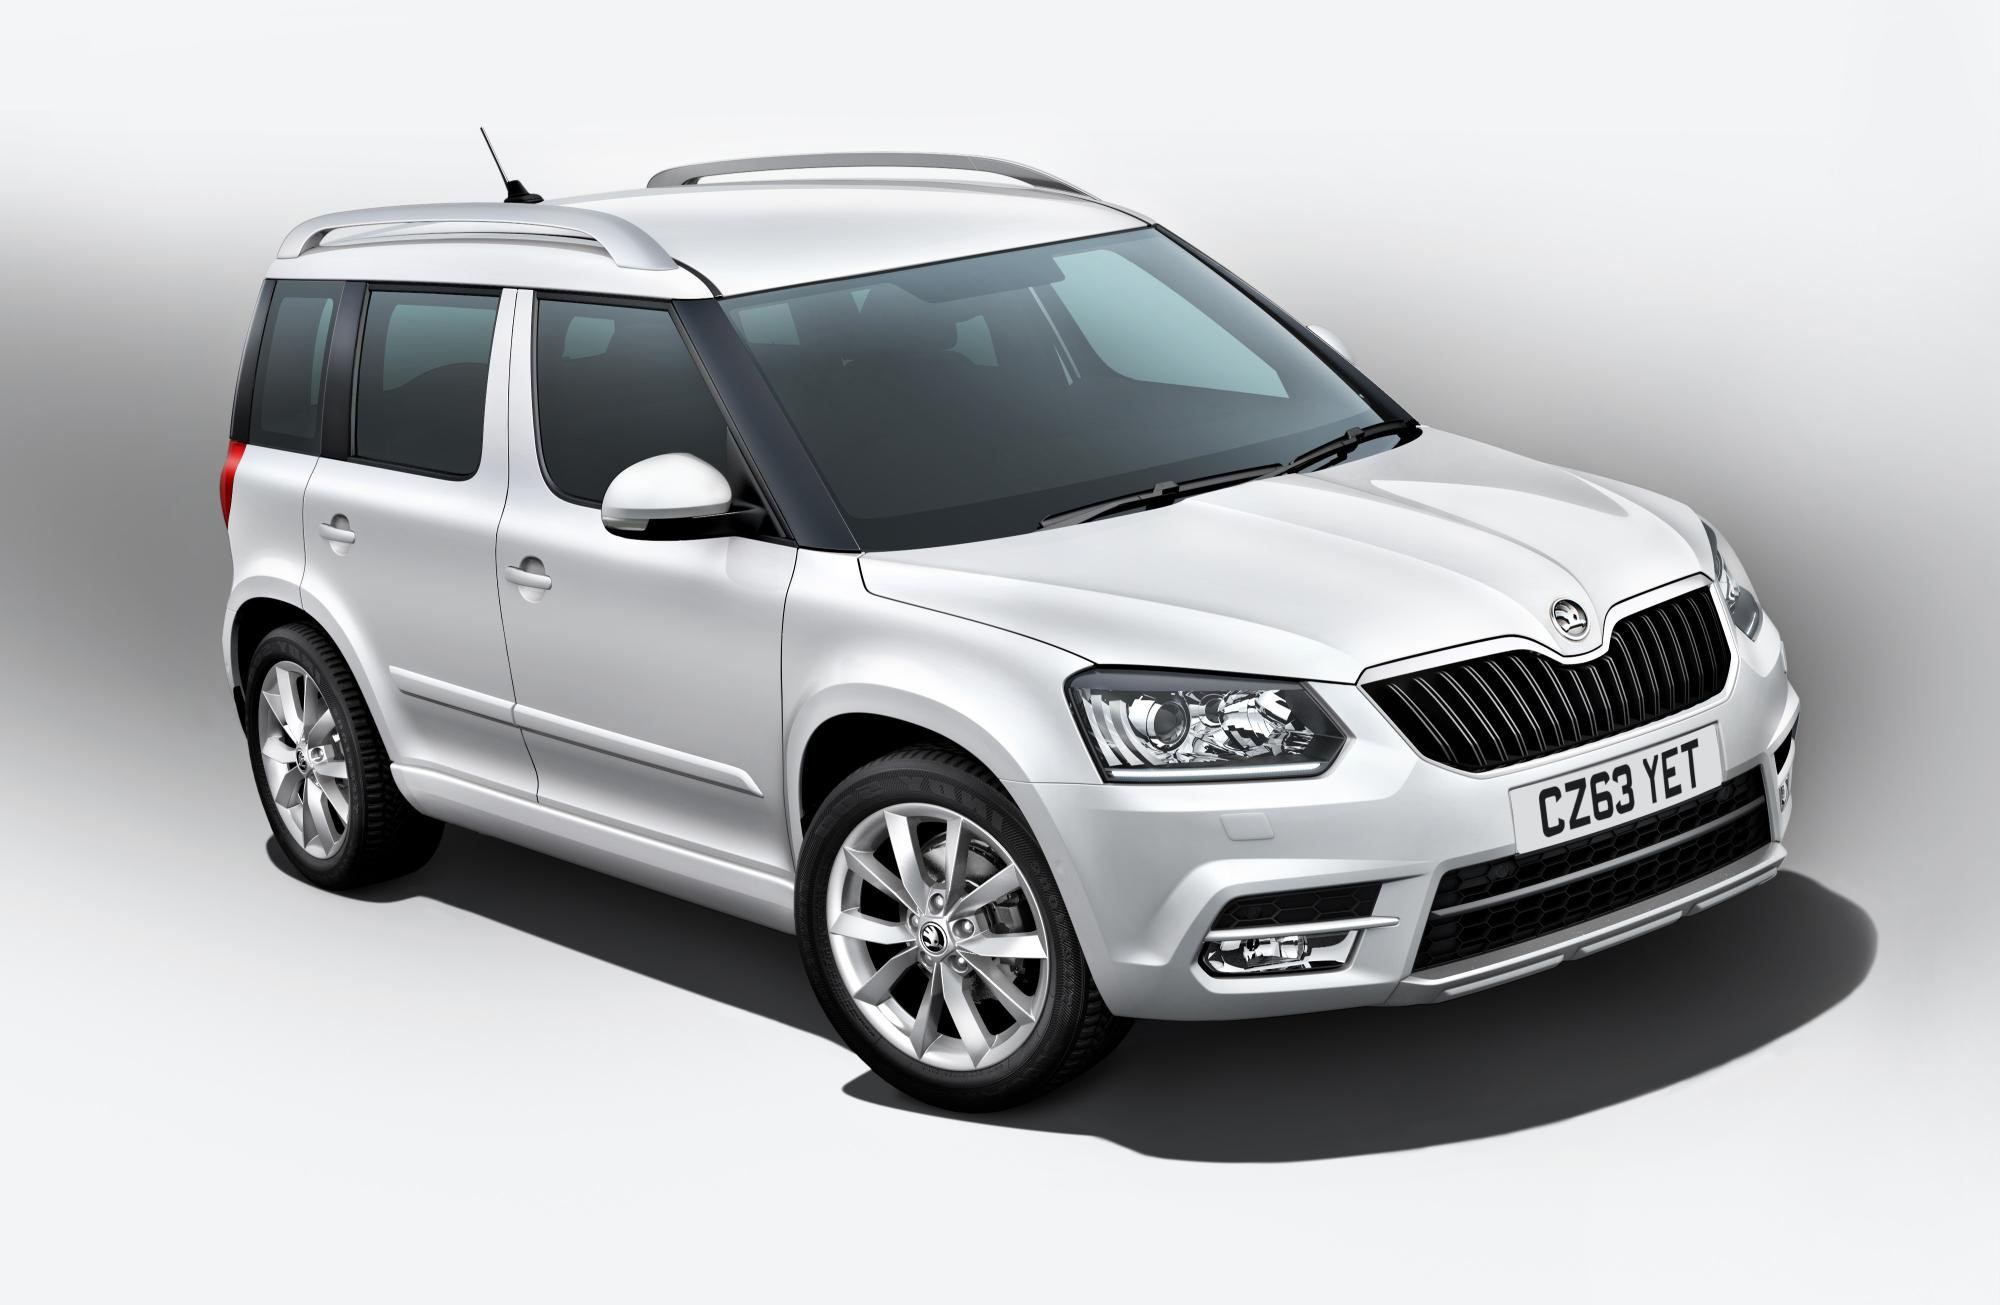 2014 Skoda Yeti Uk Pricing Announced Autoevolution